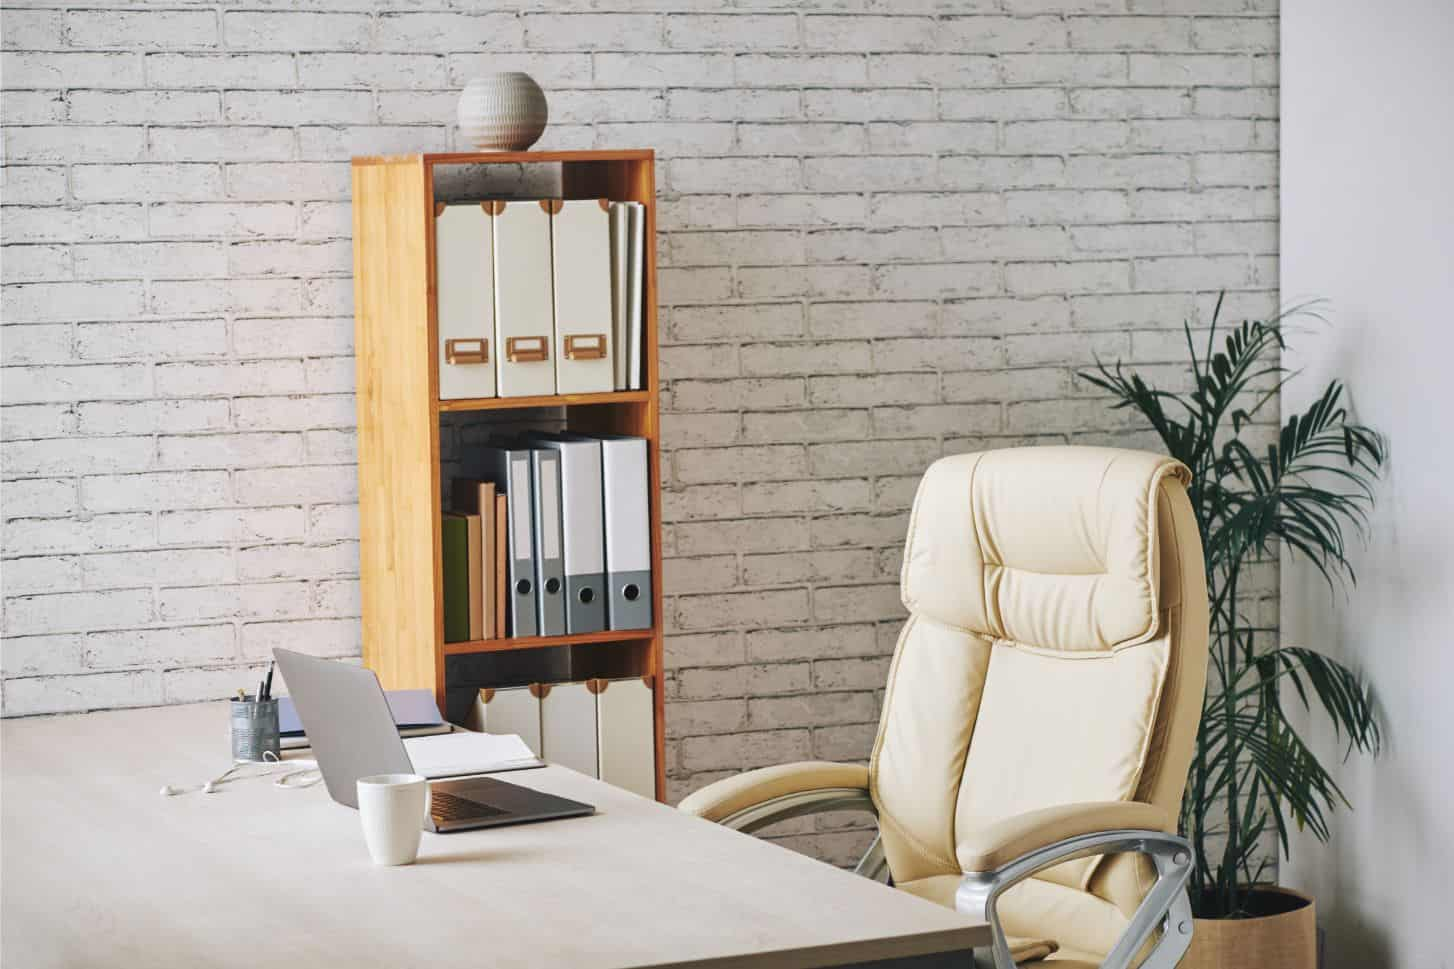 garden-home-office-essentials-1-comfortable-ergonomic-chair-freepik